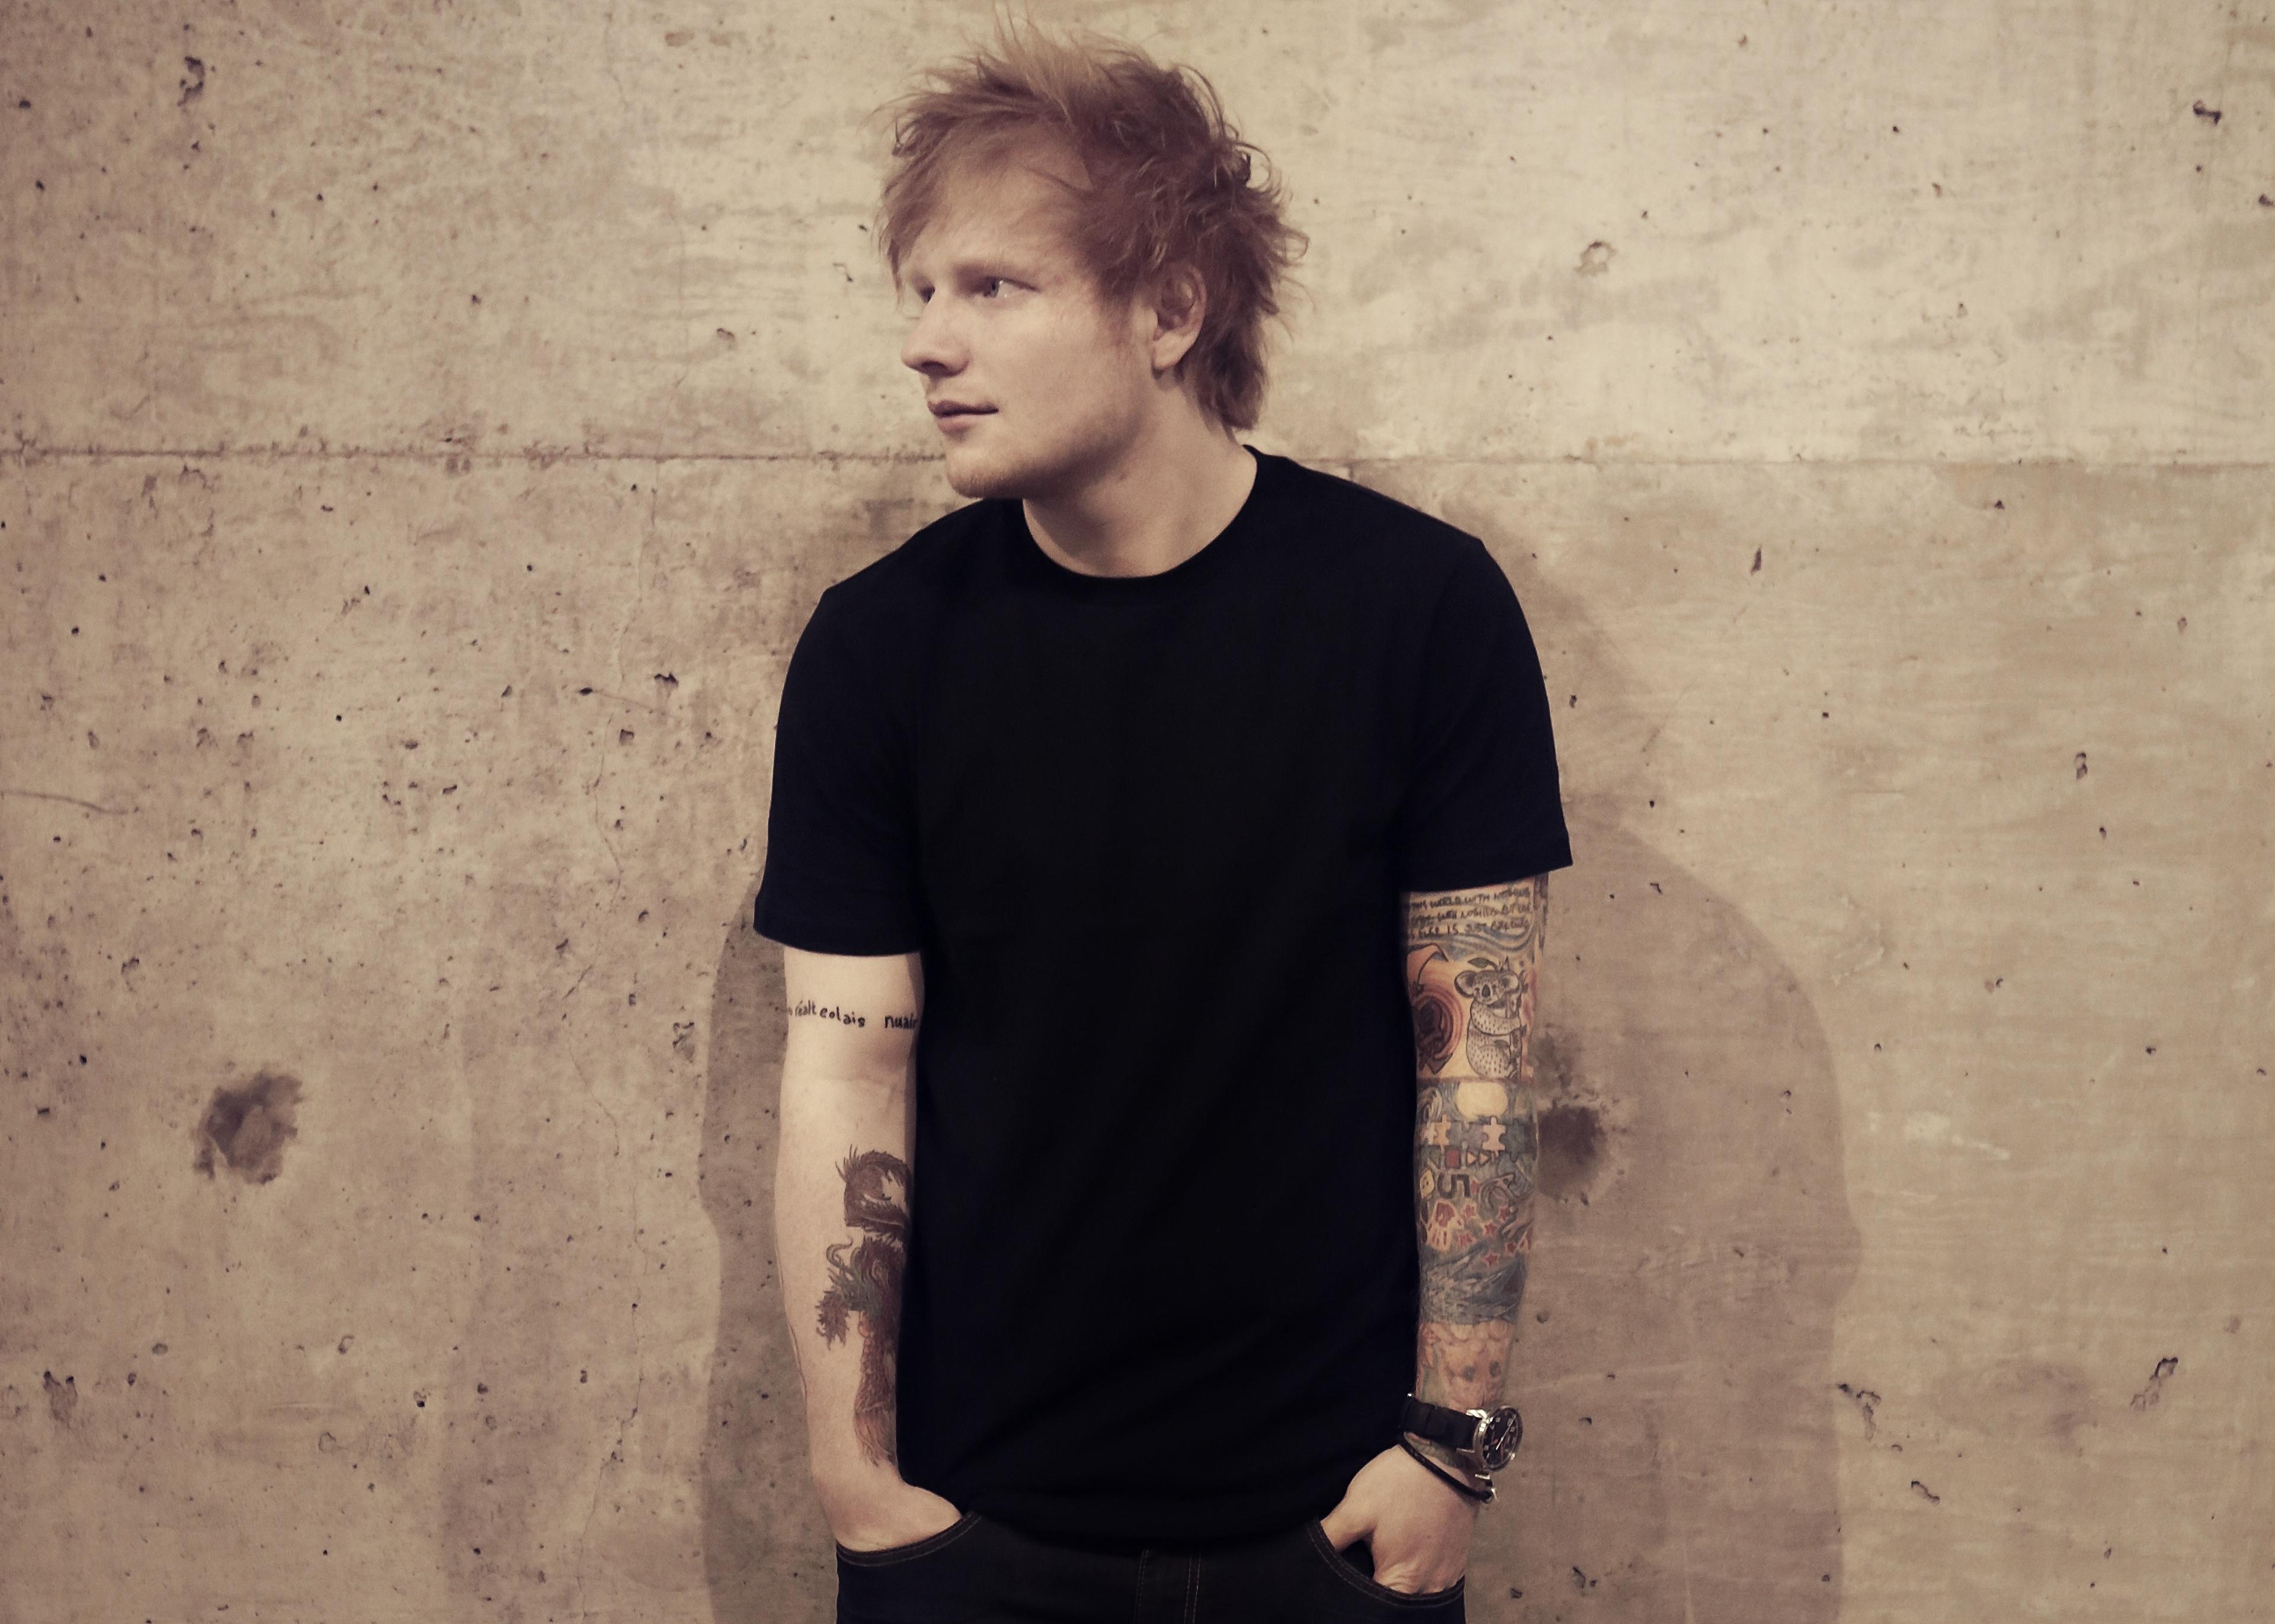 Ed Sheeran HD Wallpapers